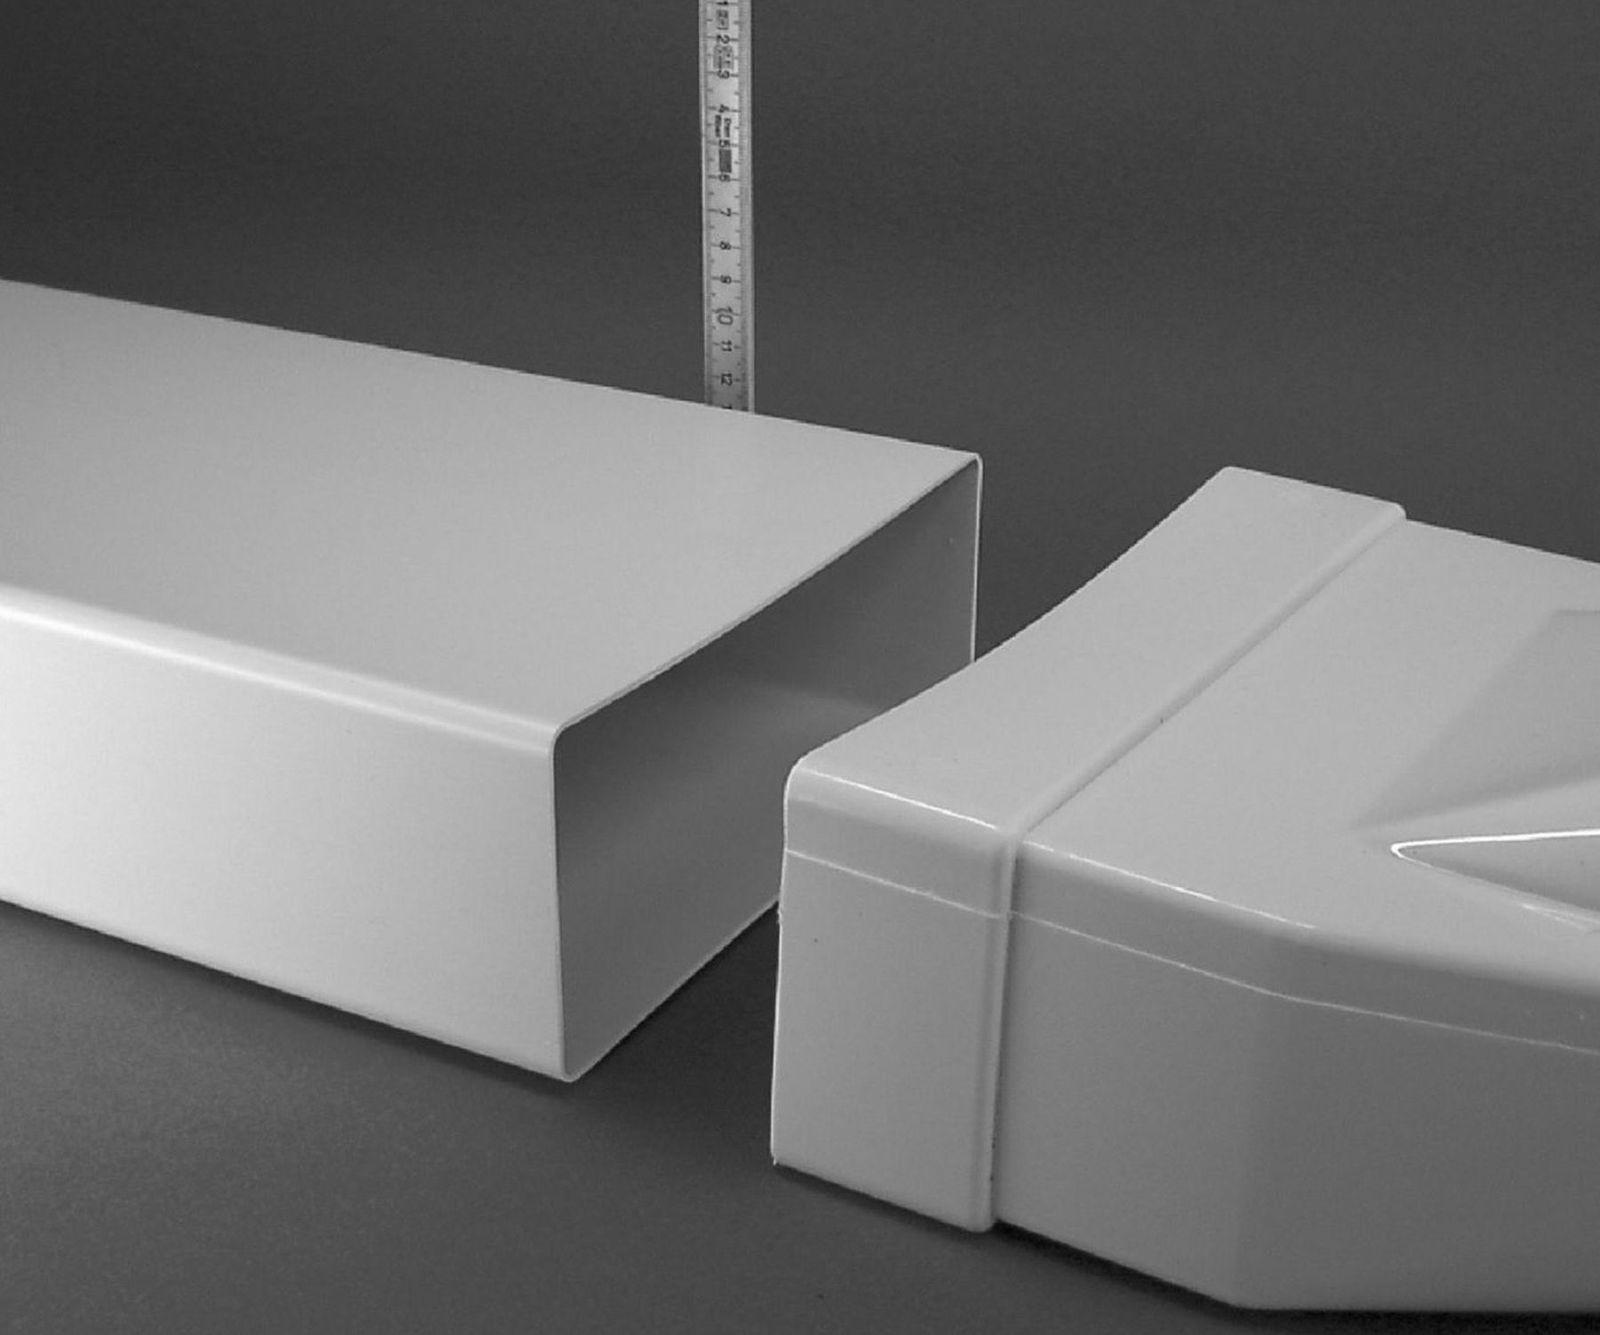 flachkanal dunstabzug cool flach dunstabzug decke in la shaube flachkanal obi with flachkanal. Black Bedroom Furniture Sets. Home Design Ideas